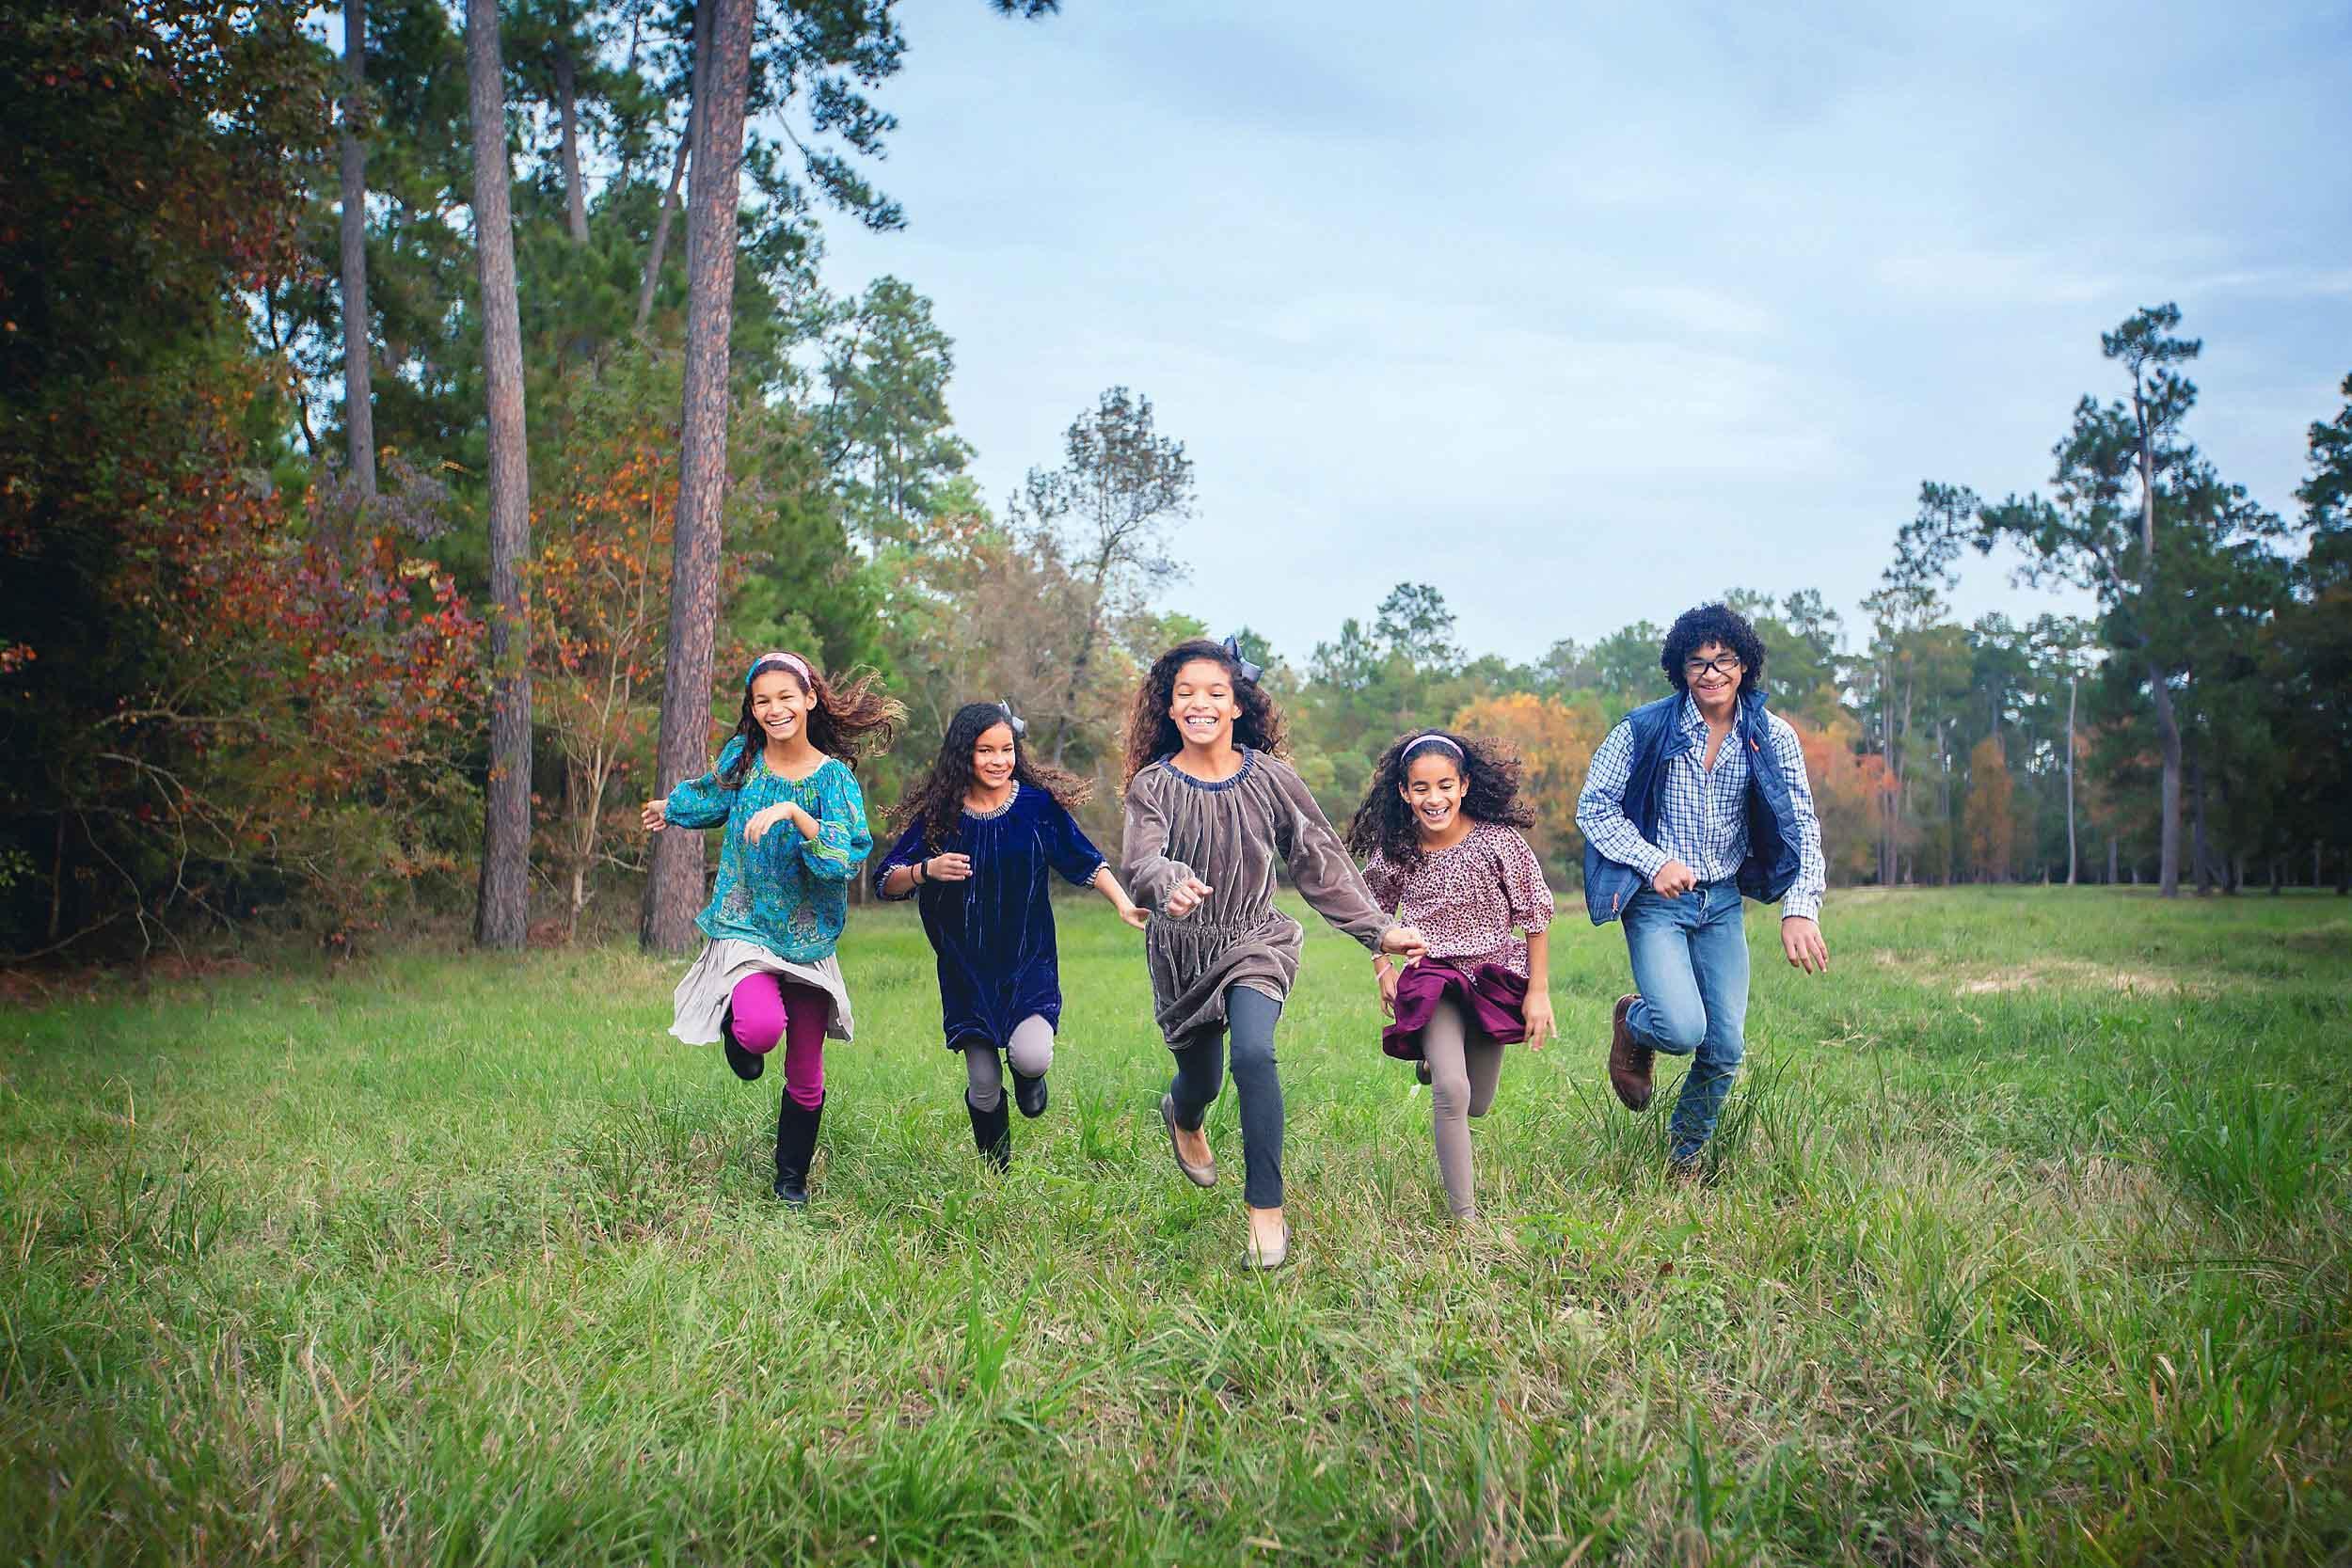 Kids lifestyle portrait by family photographer spryART photography